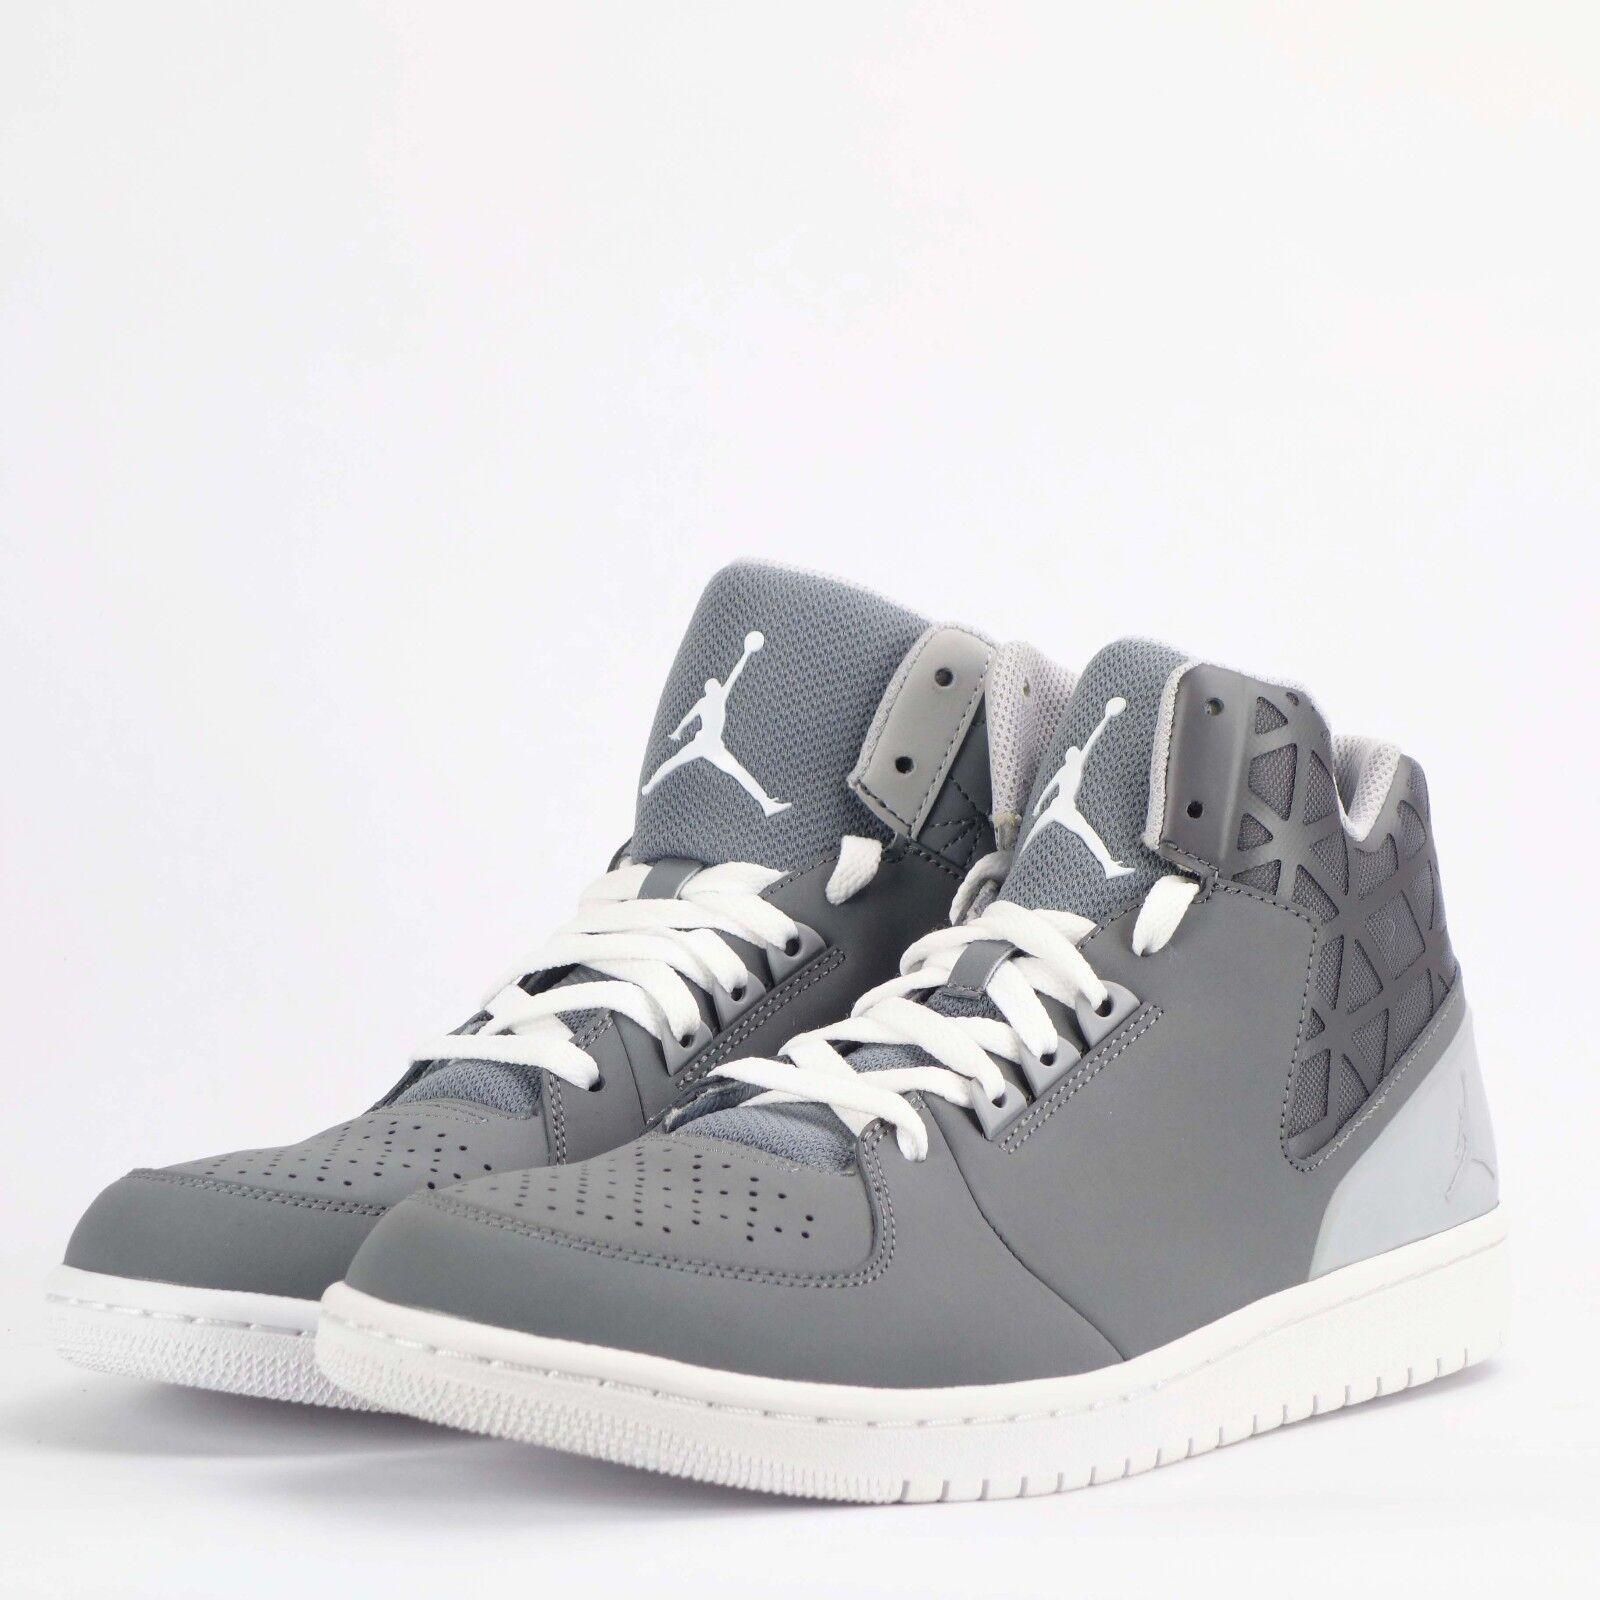 Nike Jordan 1 Flight 3 da Uomo Scarpe da FREDDO/Bianco Ginnastica GRIGIO FREDDO/Bianco da Scarpe classiche da uomo 253cec